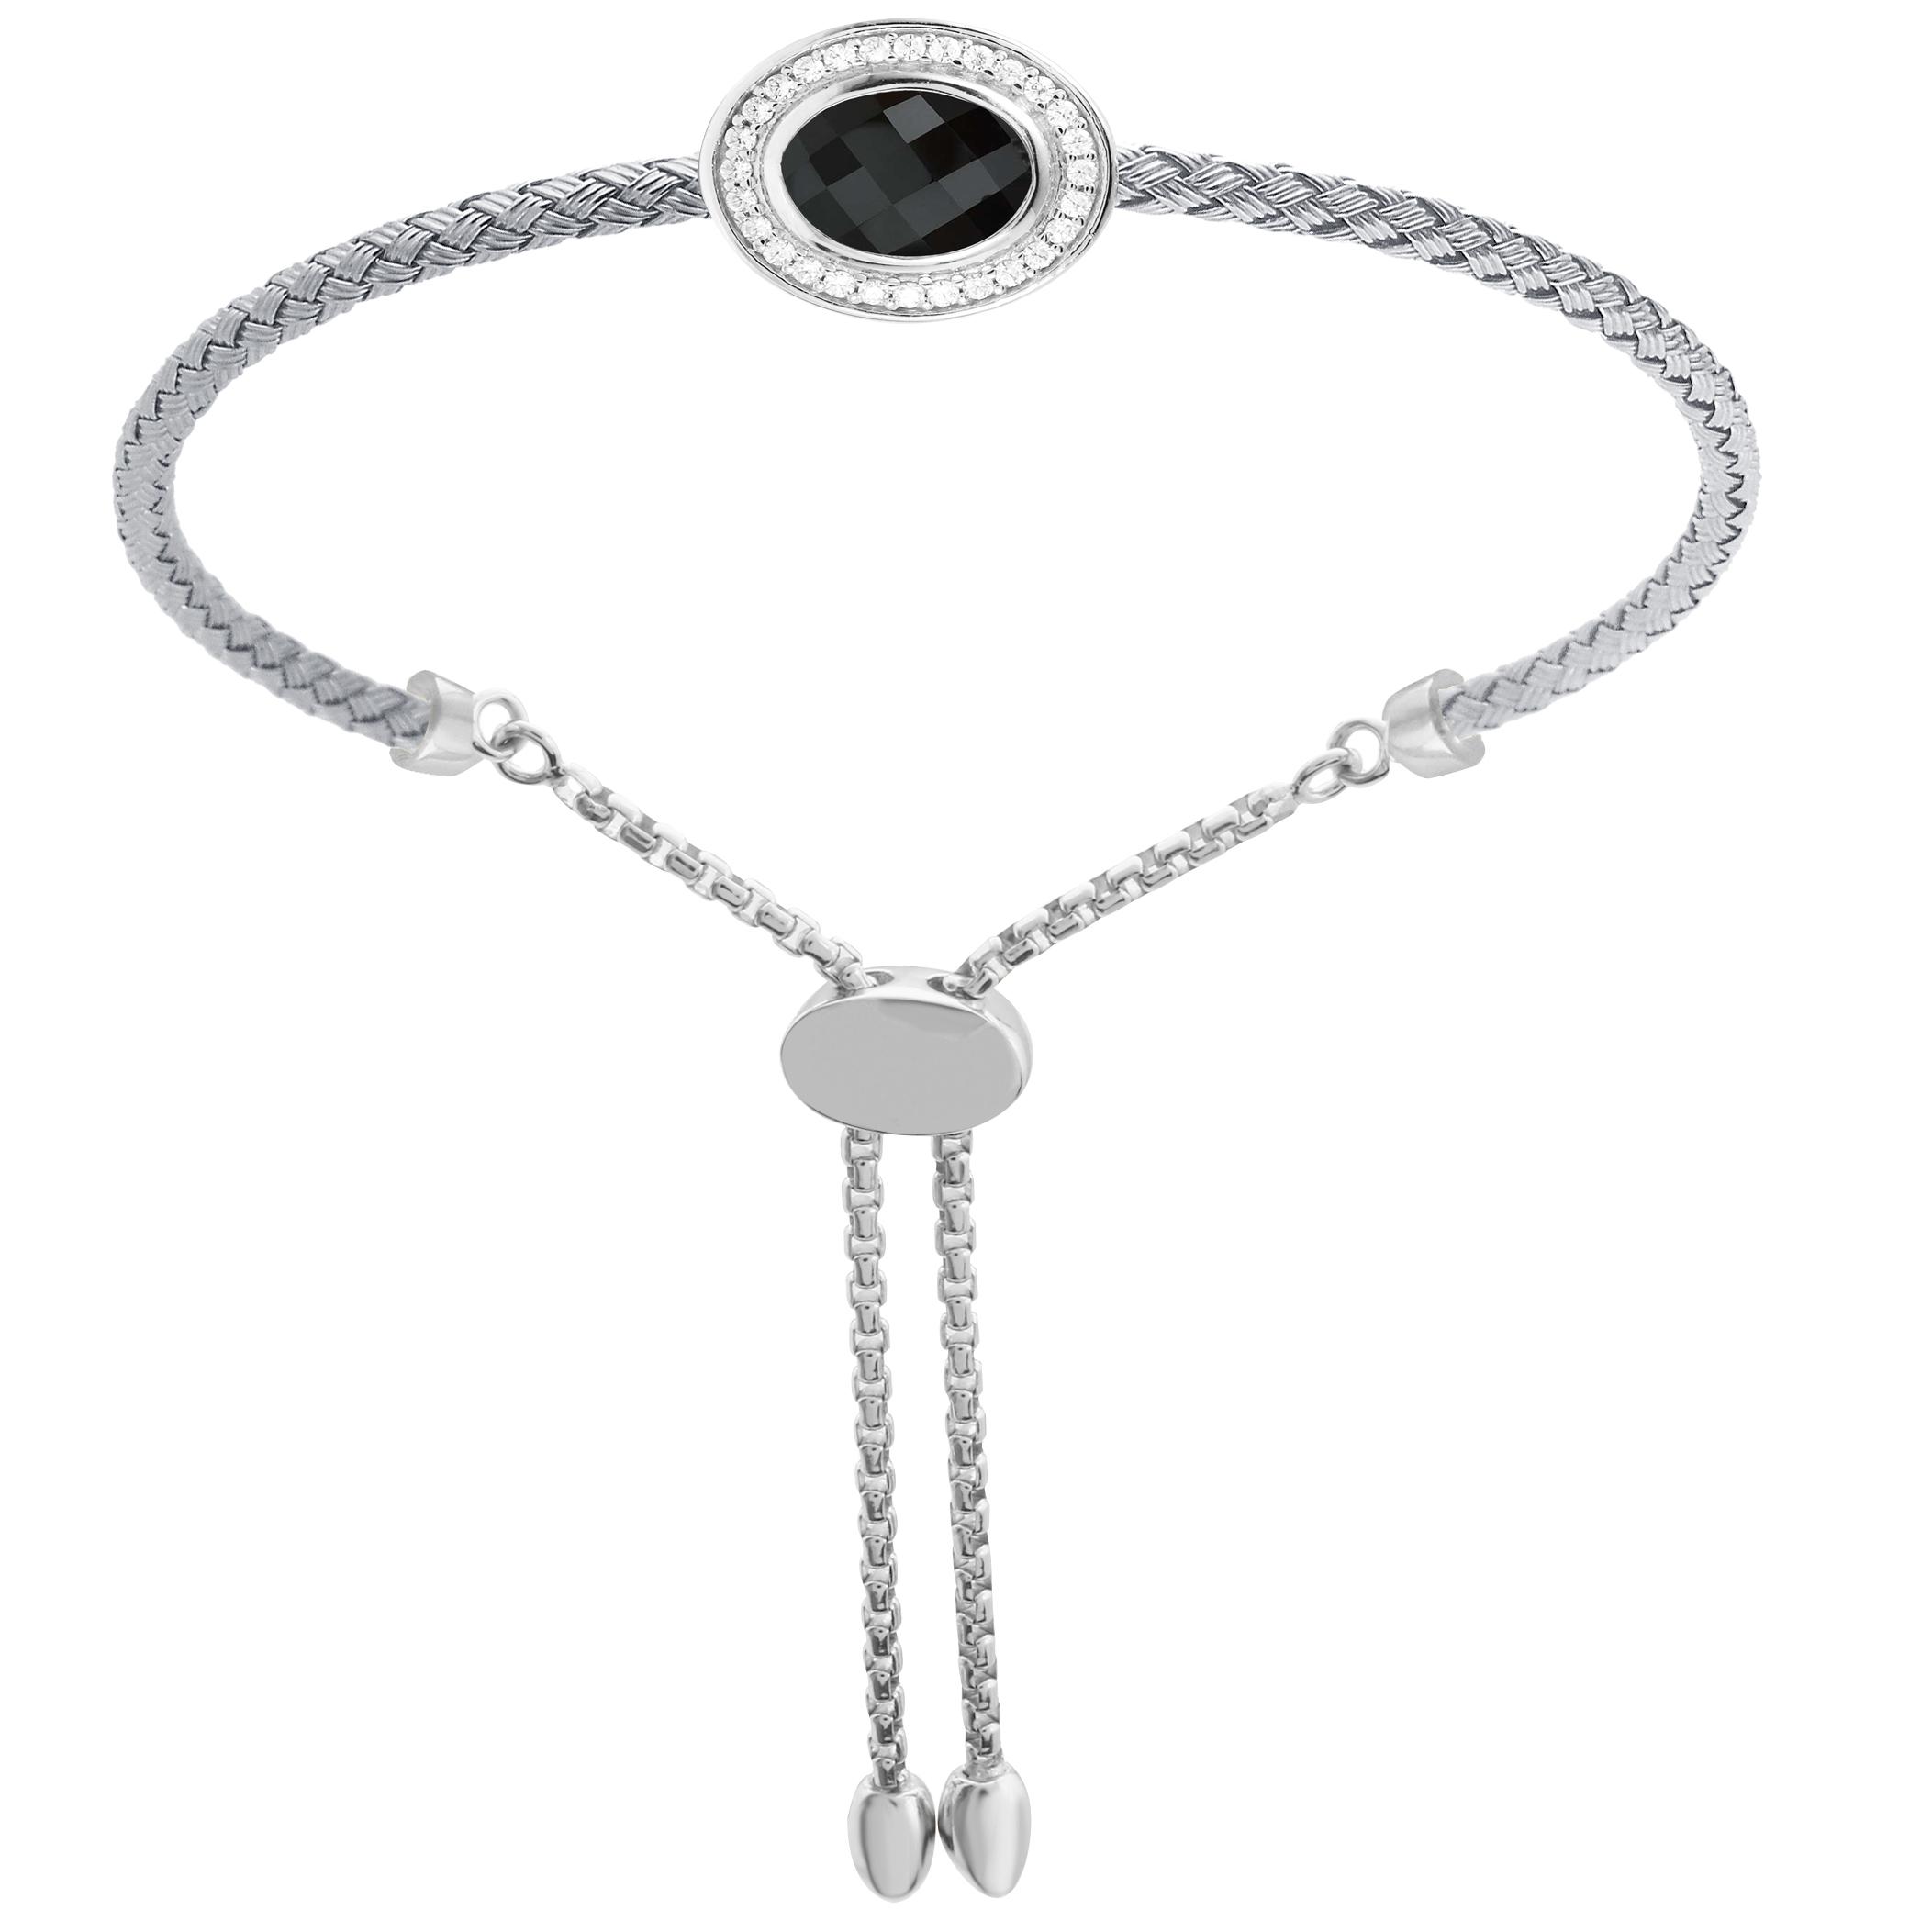 CHARLES GARNIER - Sterling Silver Onyx and CZ Bracelet